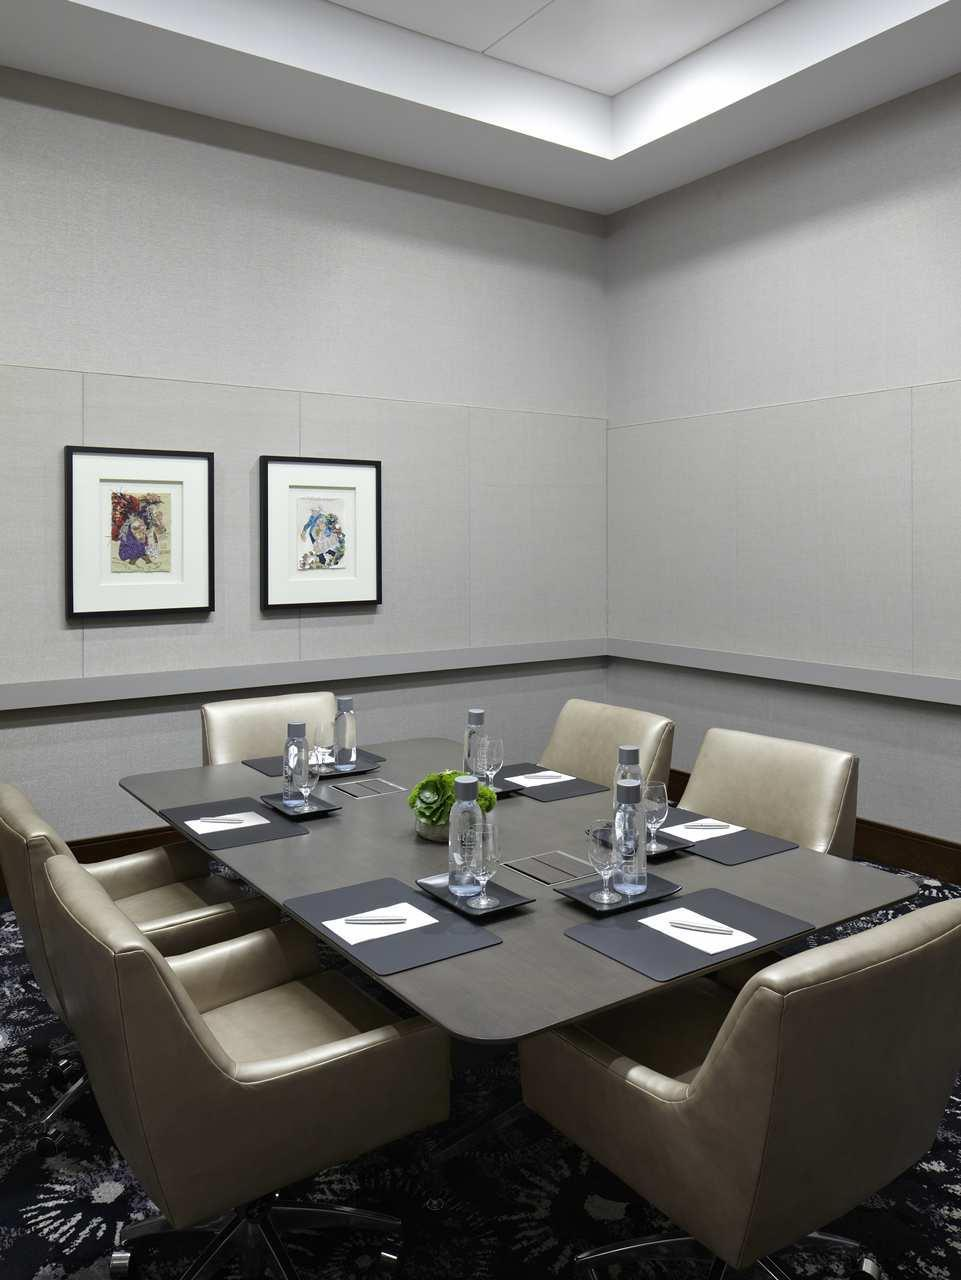 TownePlace Suites Columbus Worthington - Hotels & Resorts